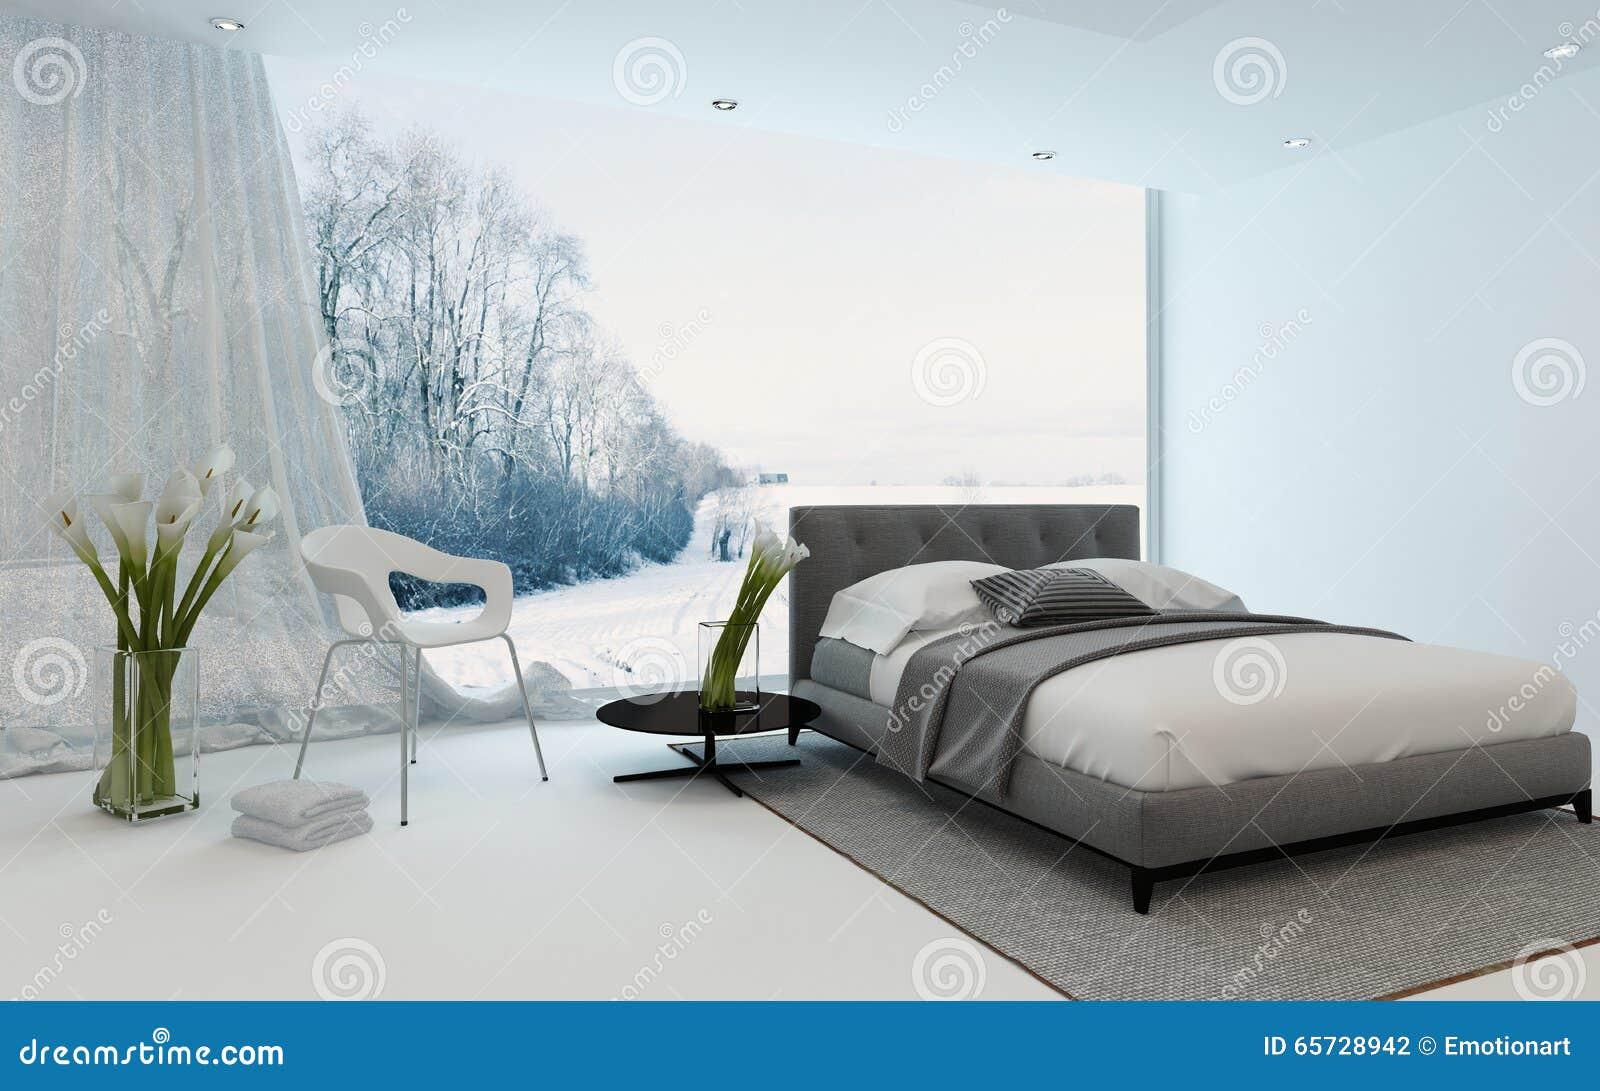 Royalty Free Illustration Download Modern Cool Bedroom Interior Overlooking